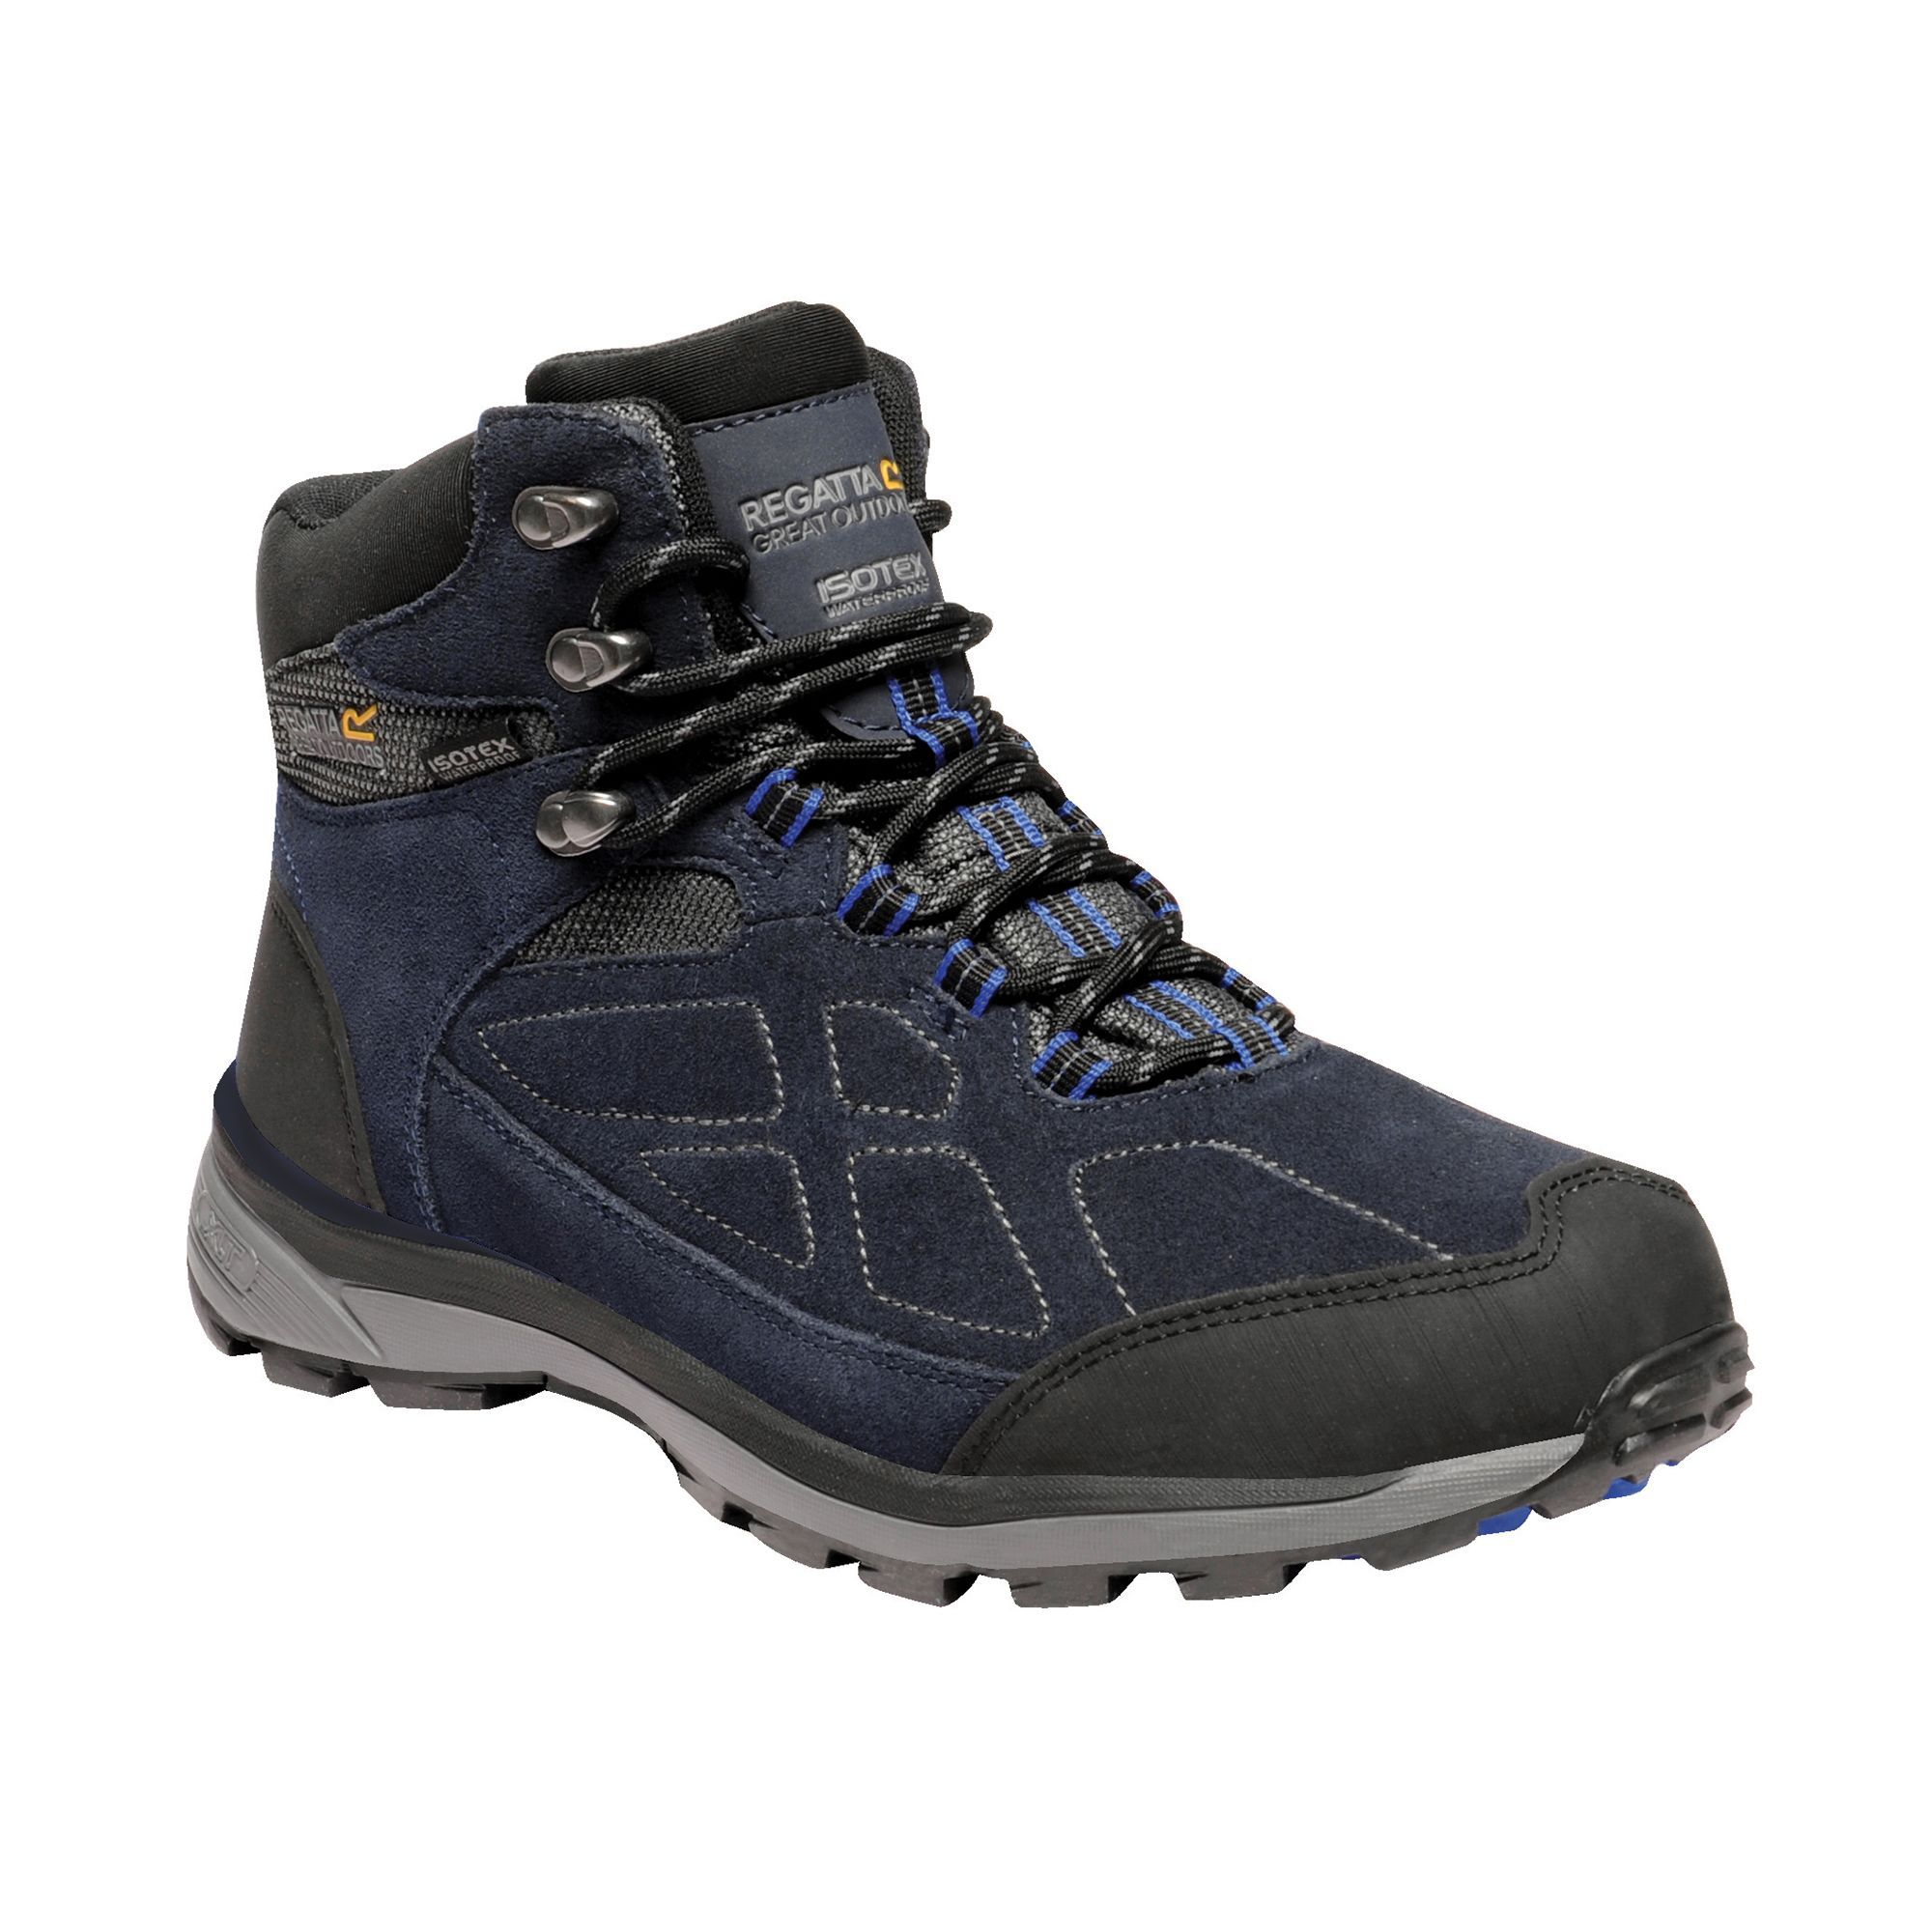 Regatta Mens Samaris Suede Hiking Boots